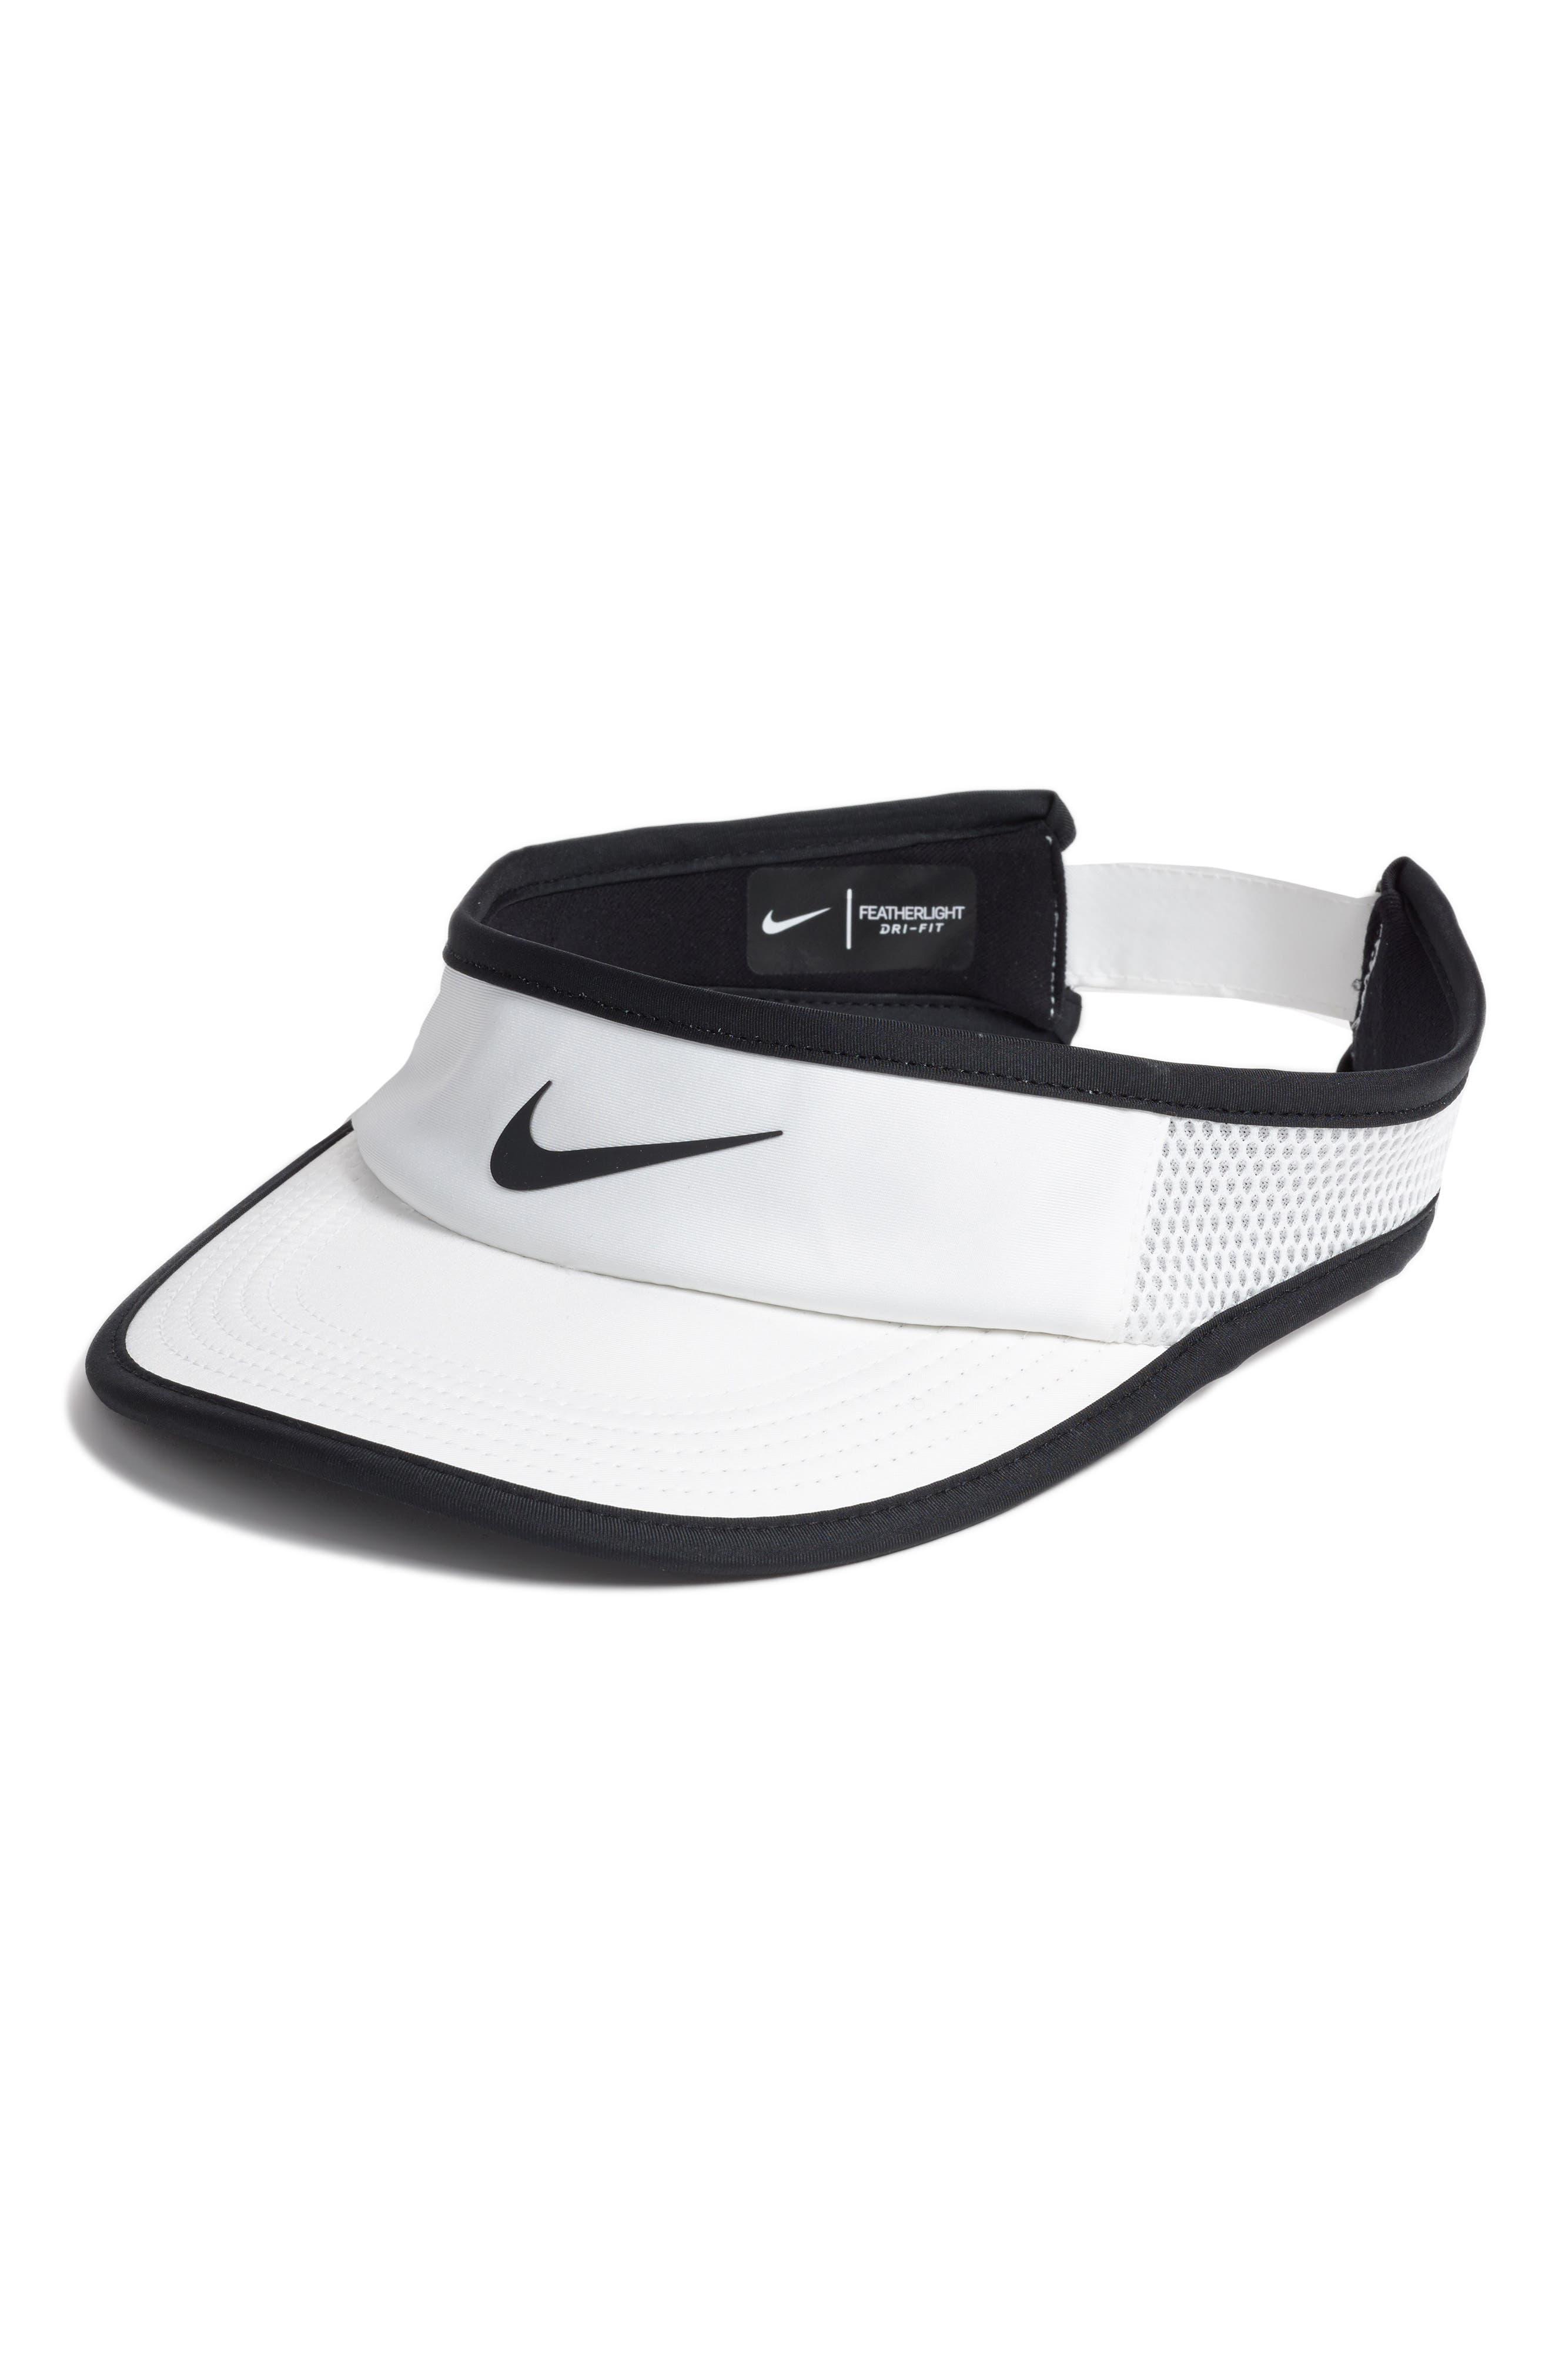 Main Image - Nike Court AeroBill Tennis Visor